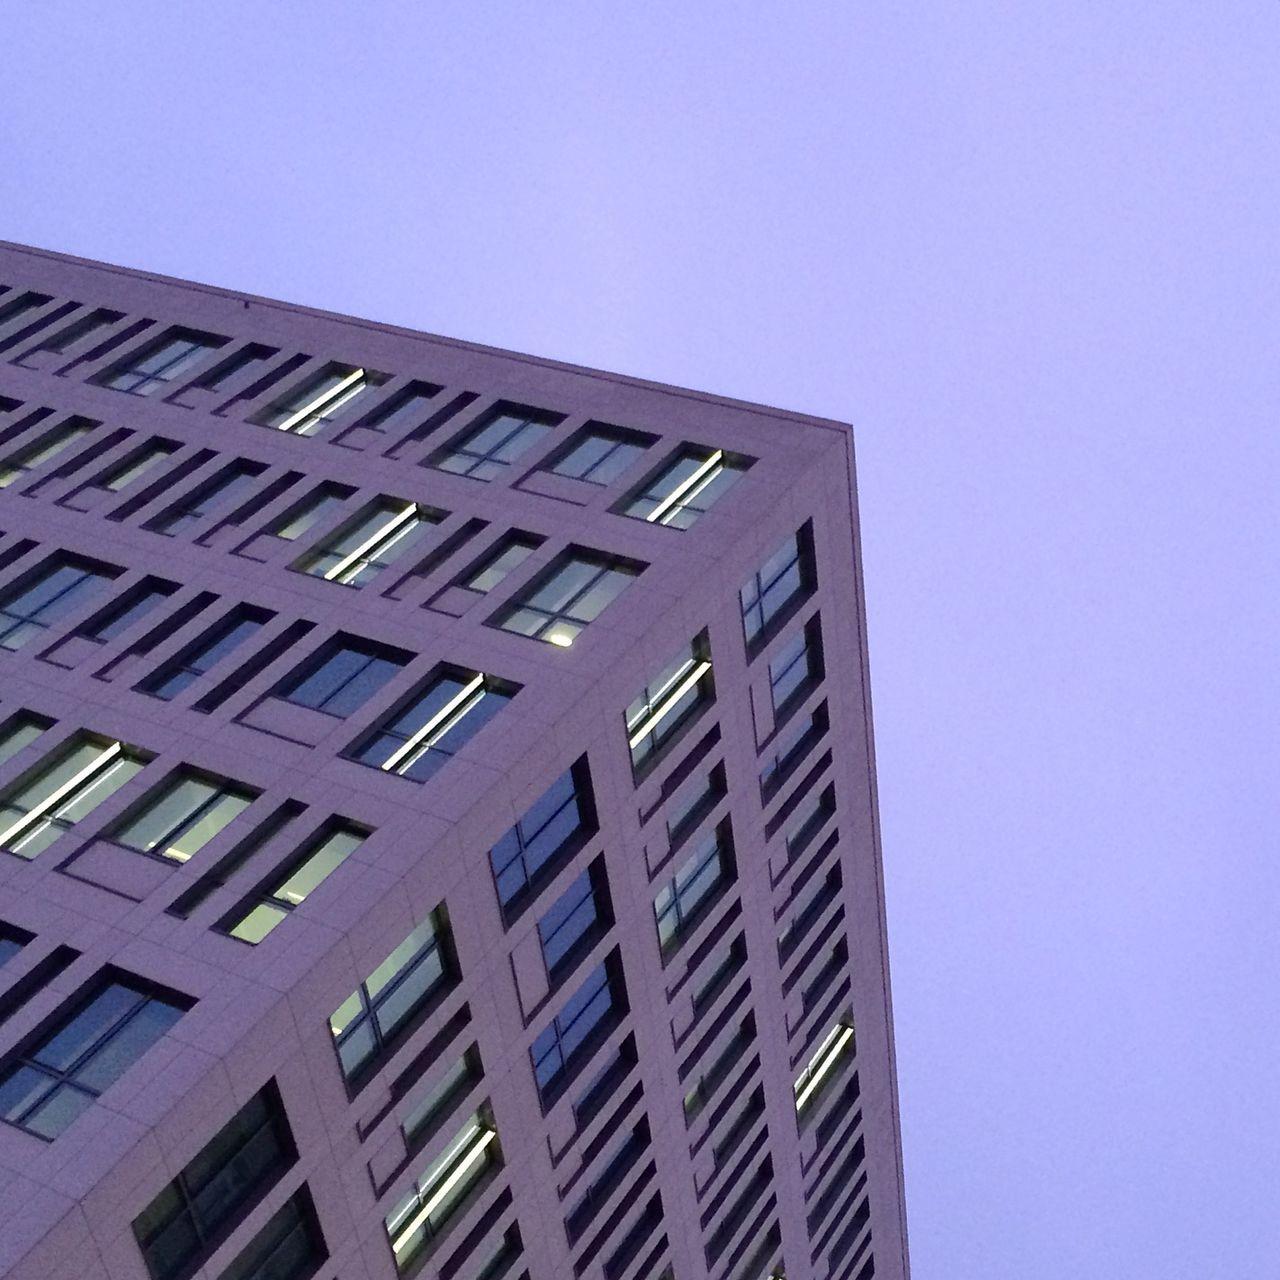 Purple tilt image of office building against sky at dusk